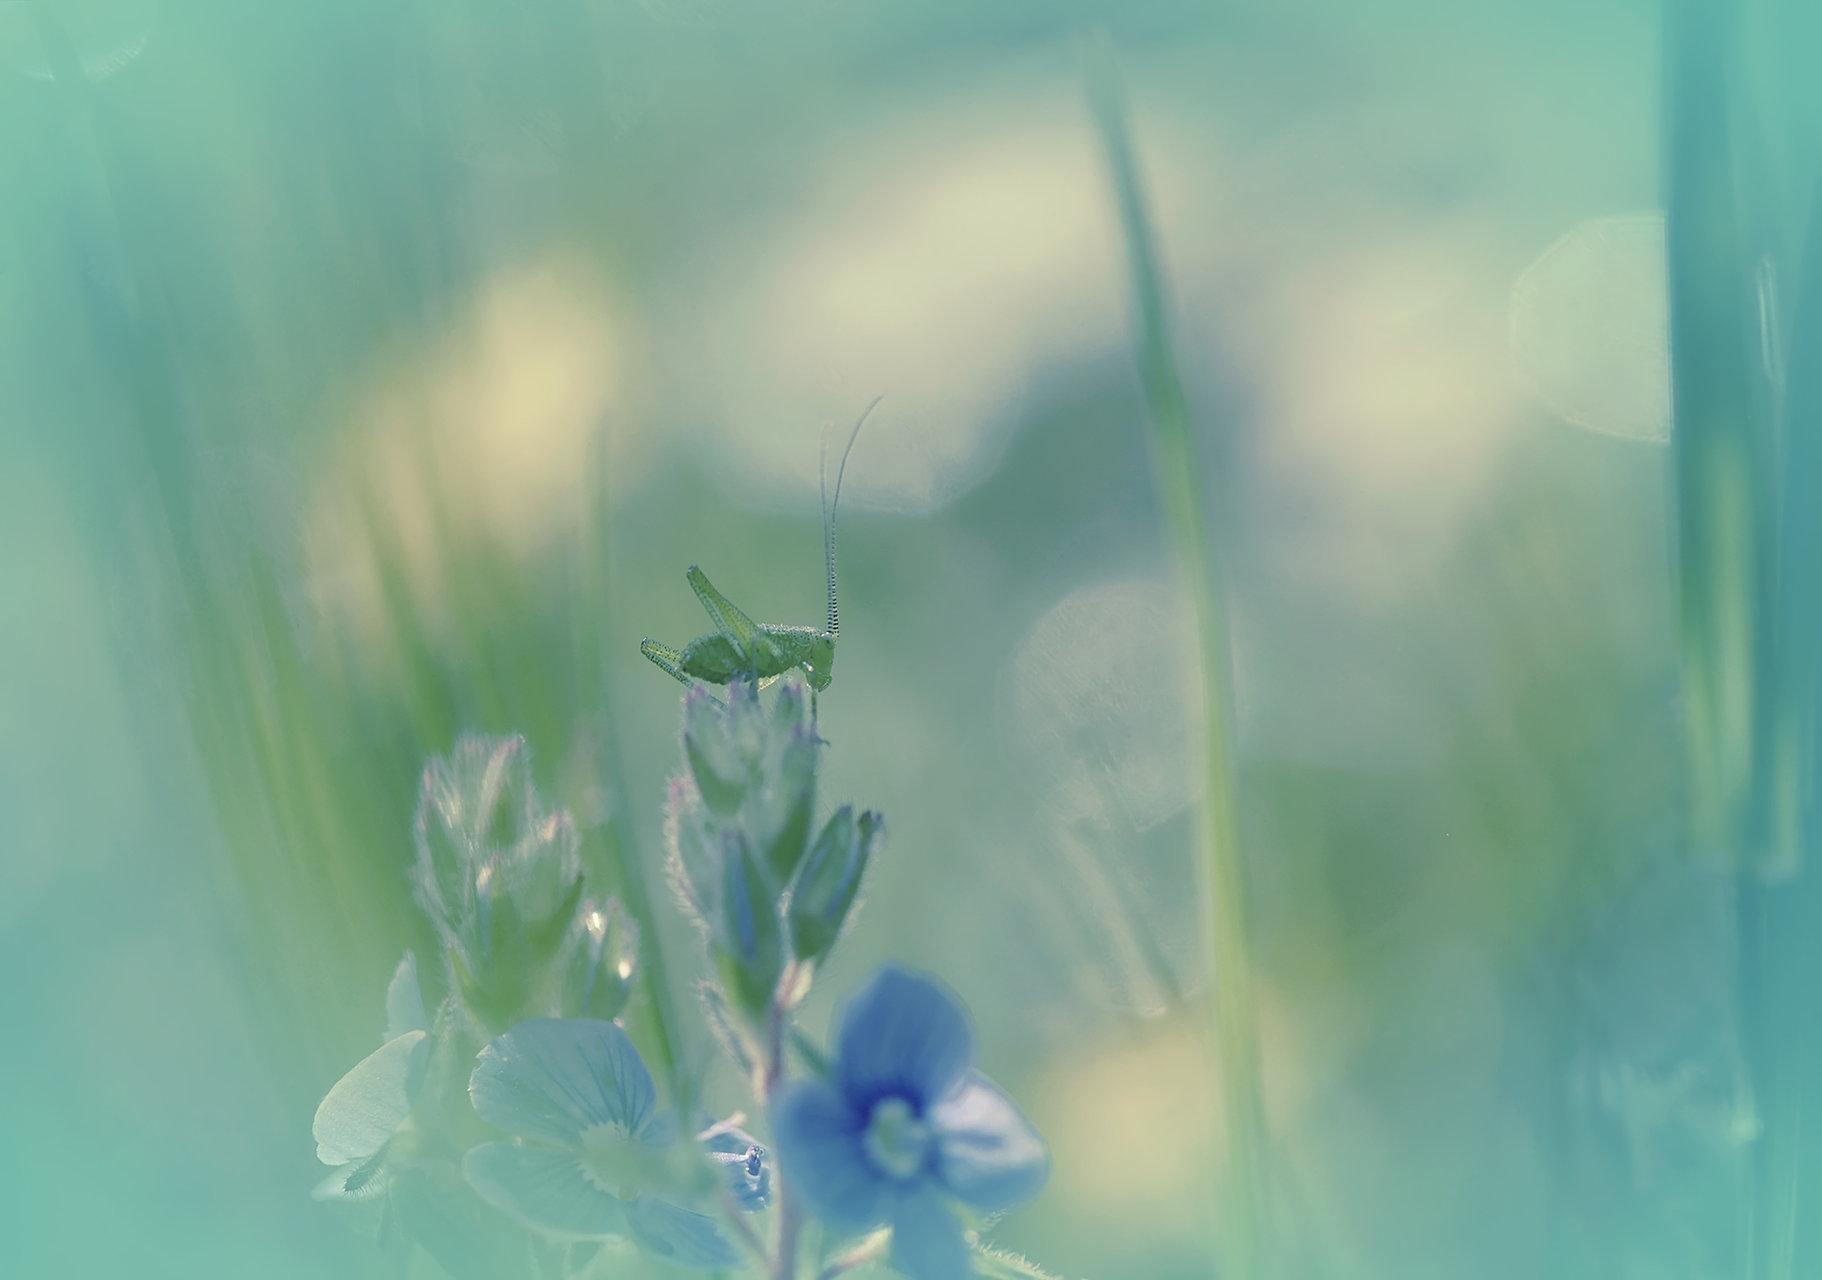 Photo in Macro | Author XristinaRuseva | PHOTO FORUM